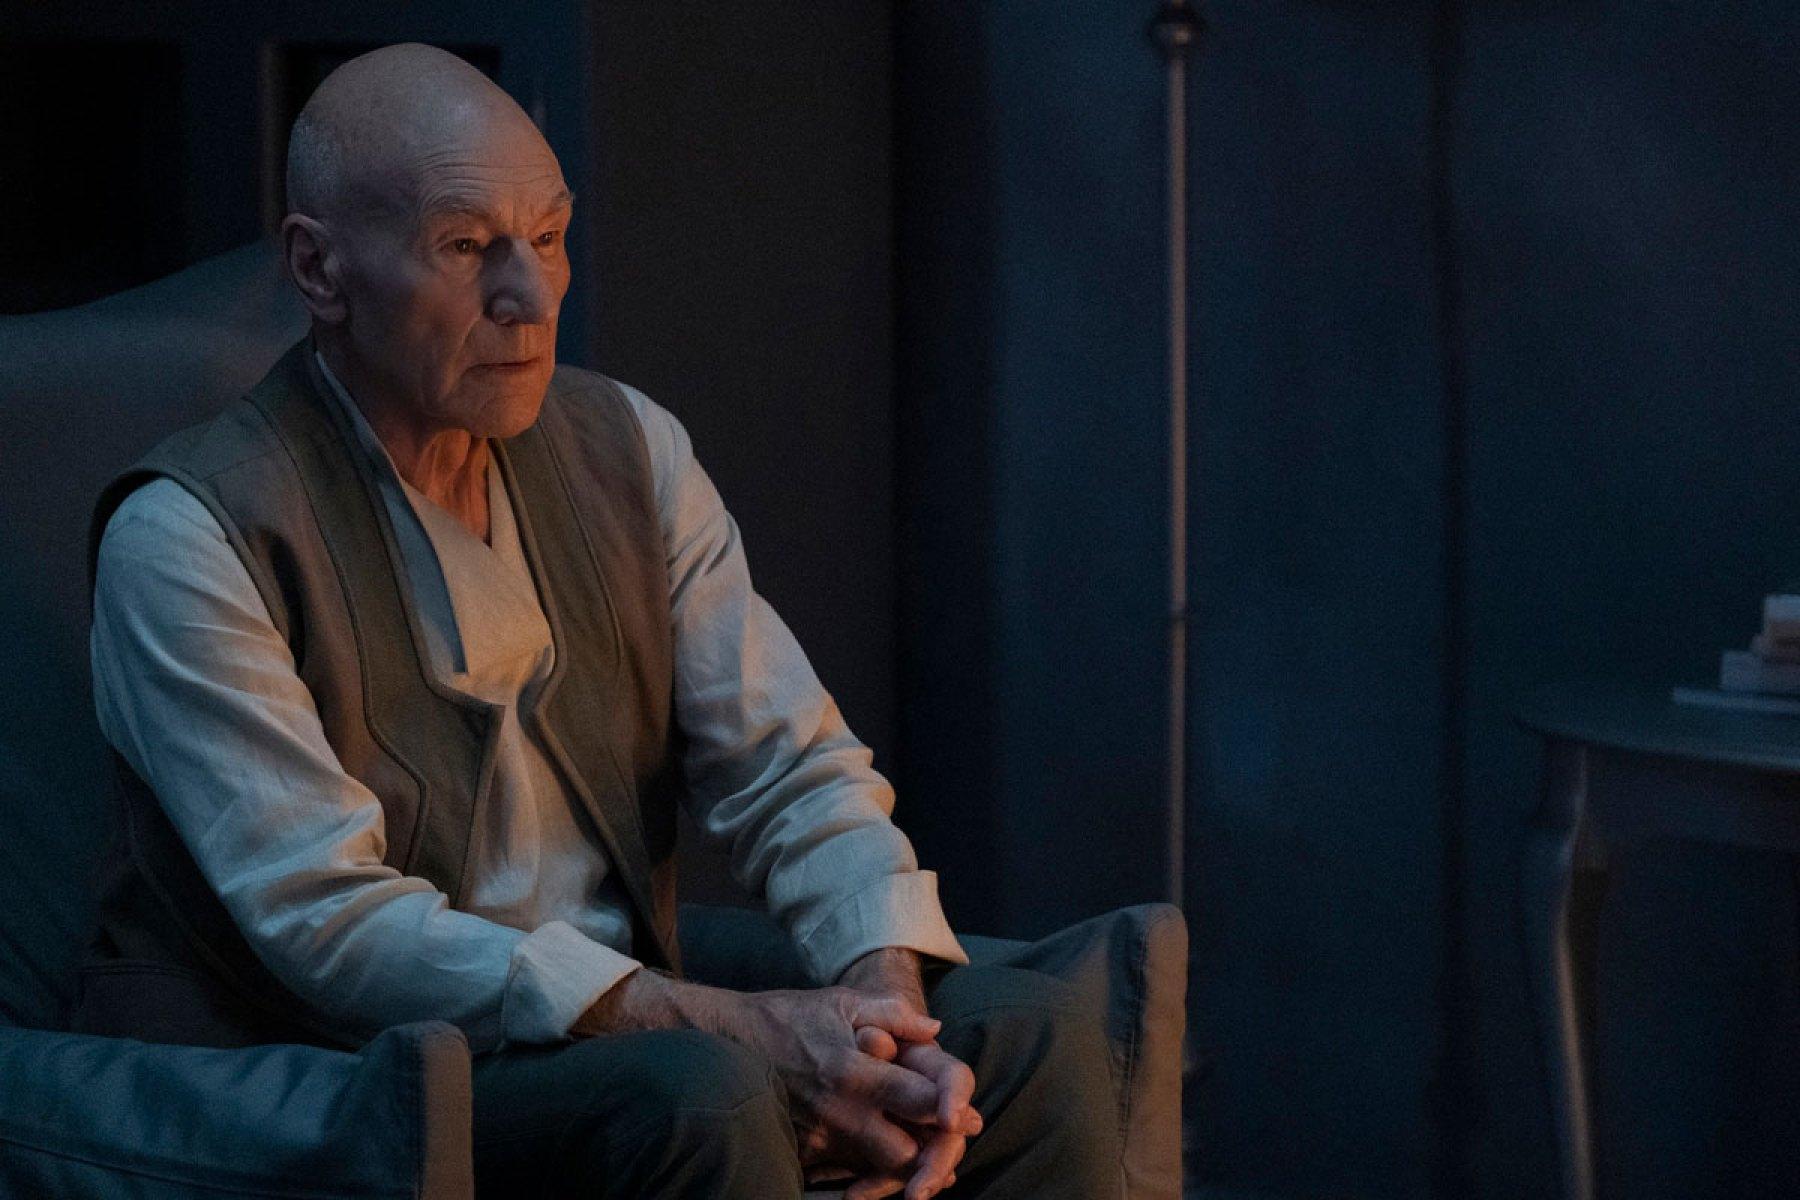 Watch: New trailer for Star Trek: Picard Season 2